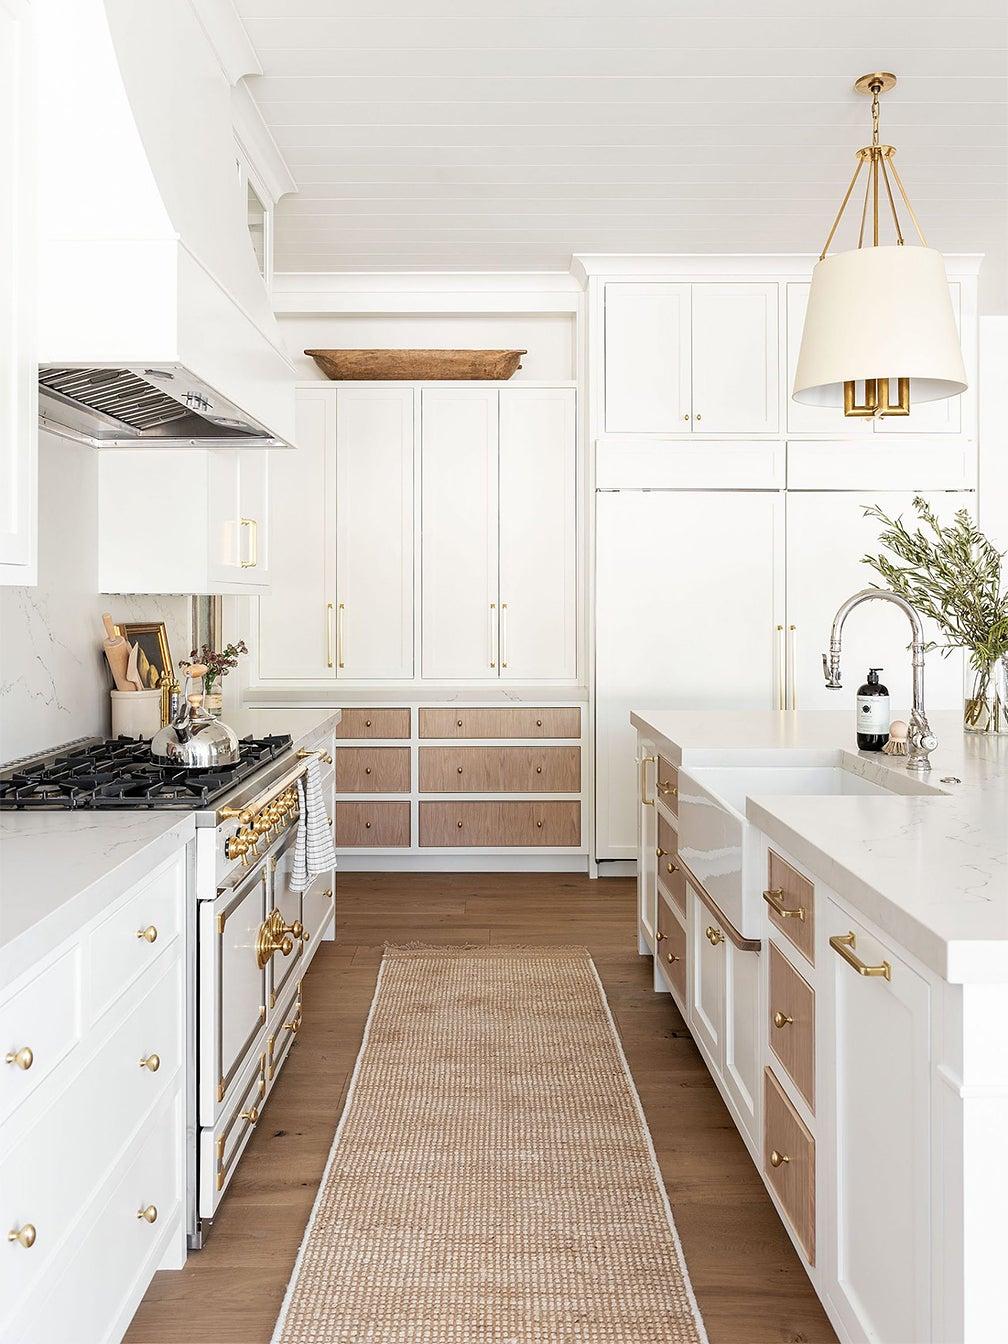 00-FEATURE-kitchen-cabinet-ideas-domino